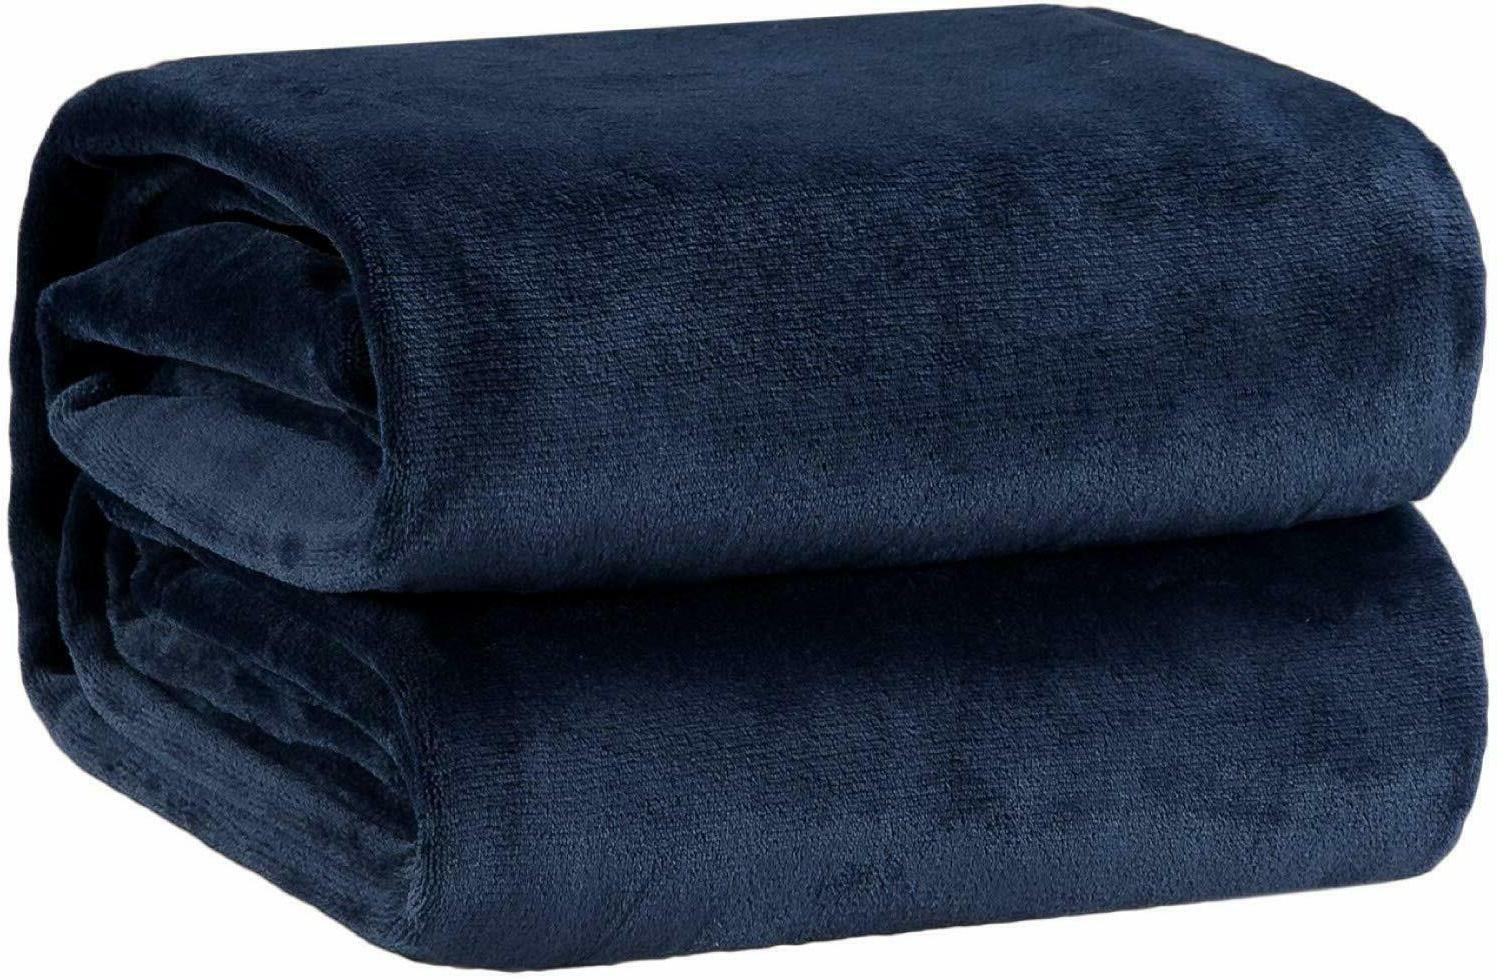 fleece blanket throw size navy lightweight super